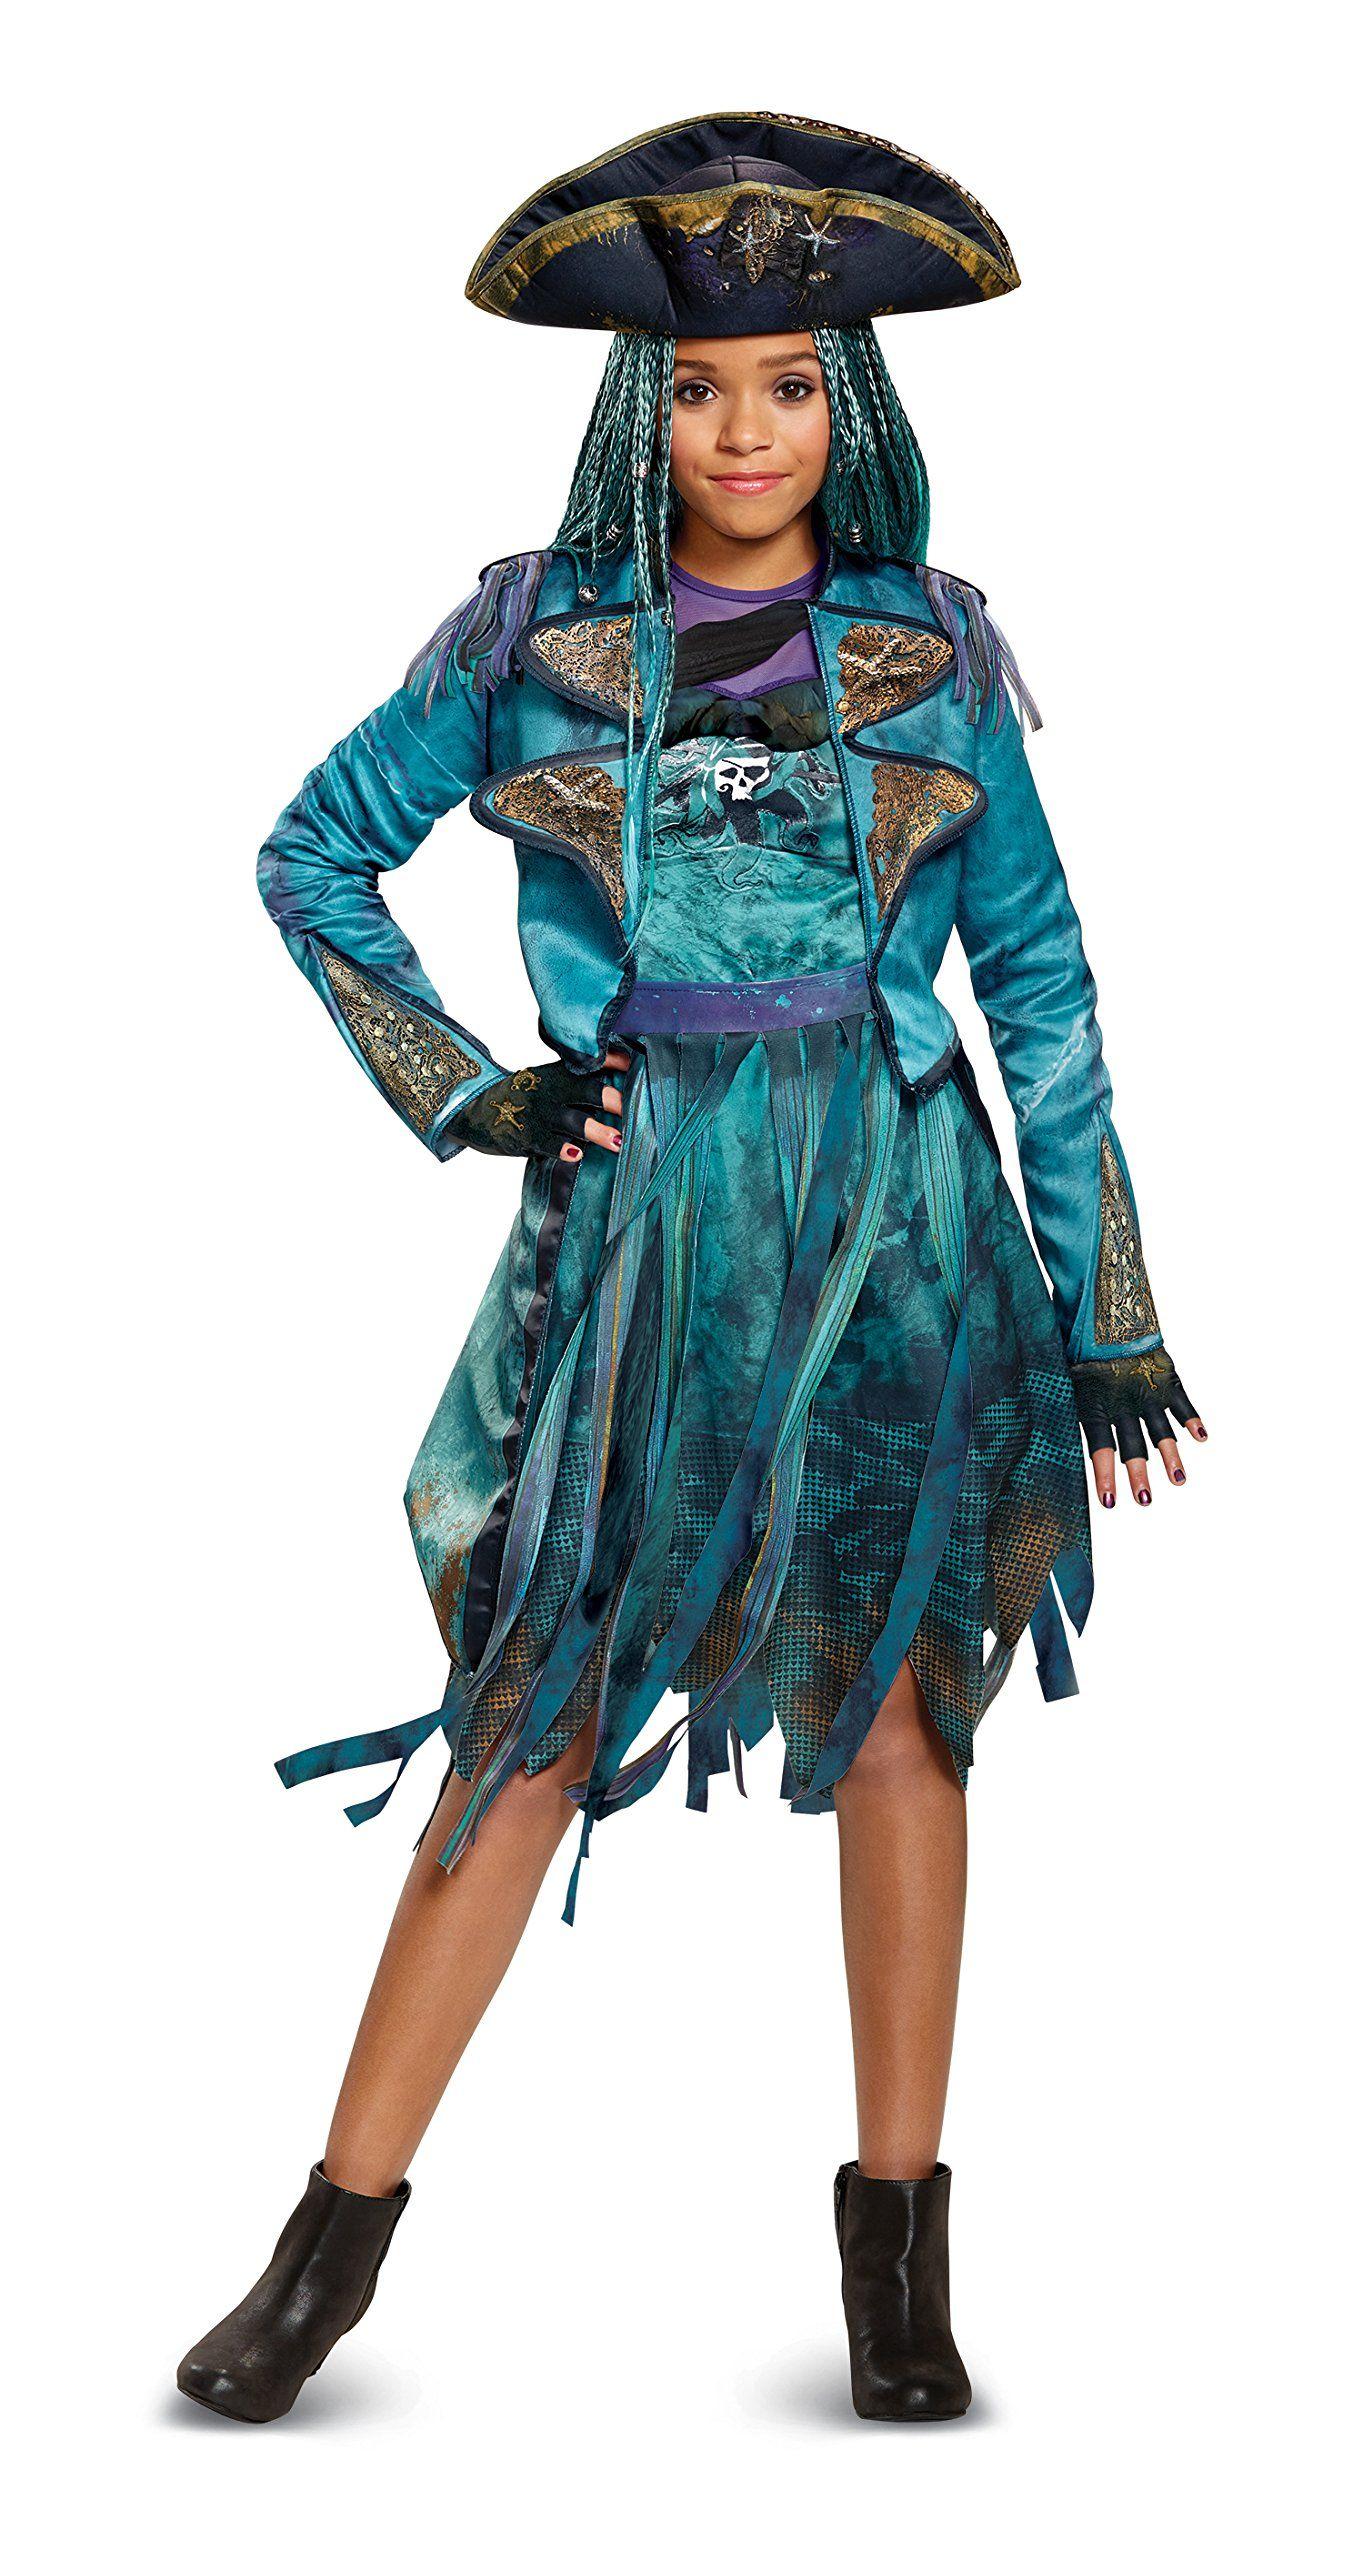 Disney Uma Deluxe Descendants 2 Costume Teal Medium 78 Have A Look At This Fantastic Product This Is An Affi Vestidos Incriveis Vestidos Fantasia Da Disney